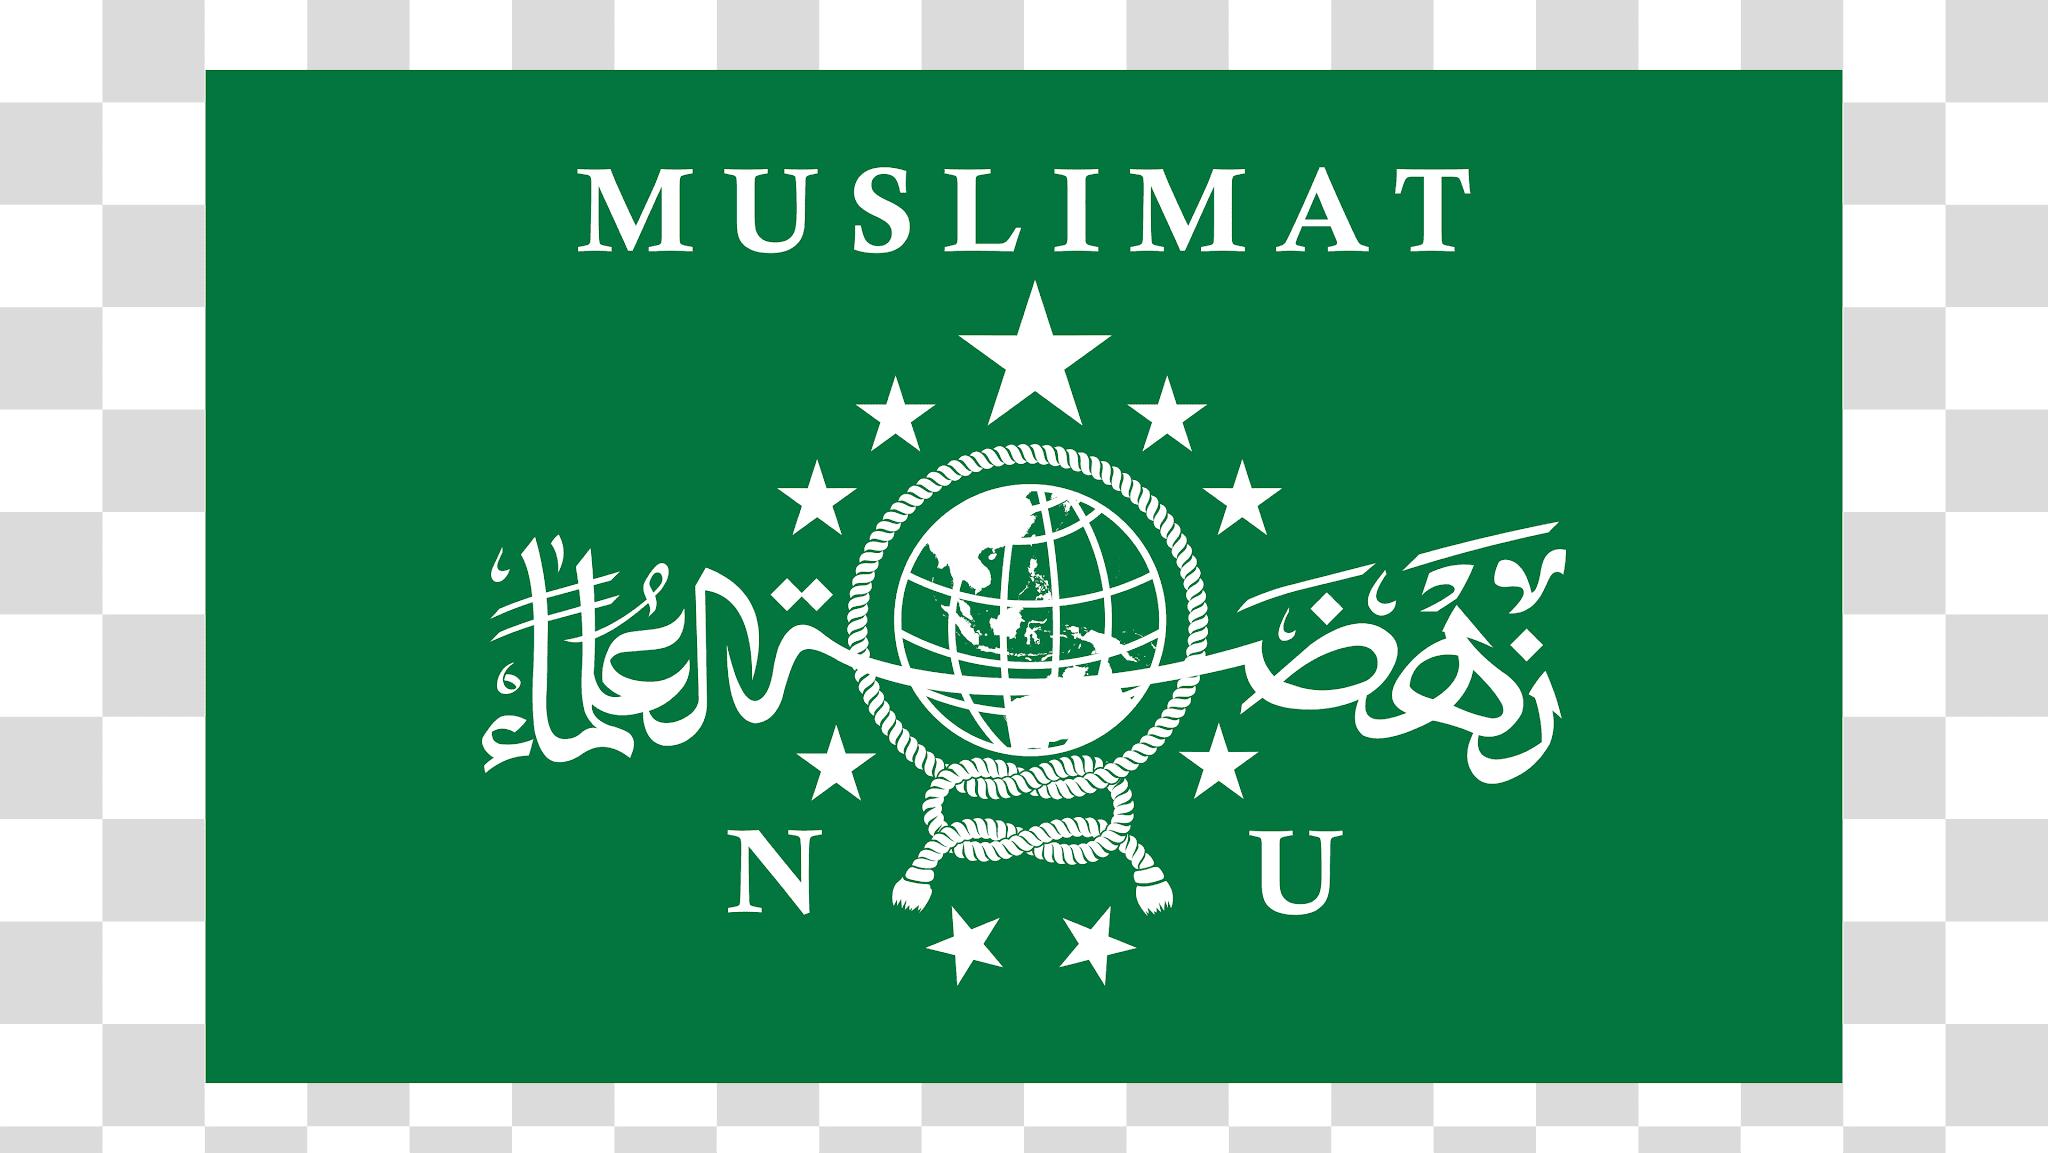 Muslimat NU Logo PNG Transparent Image